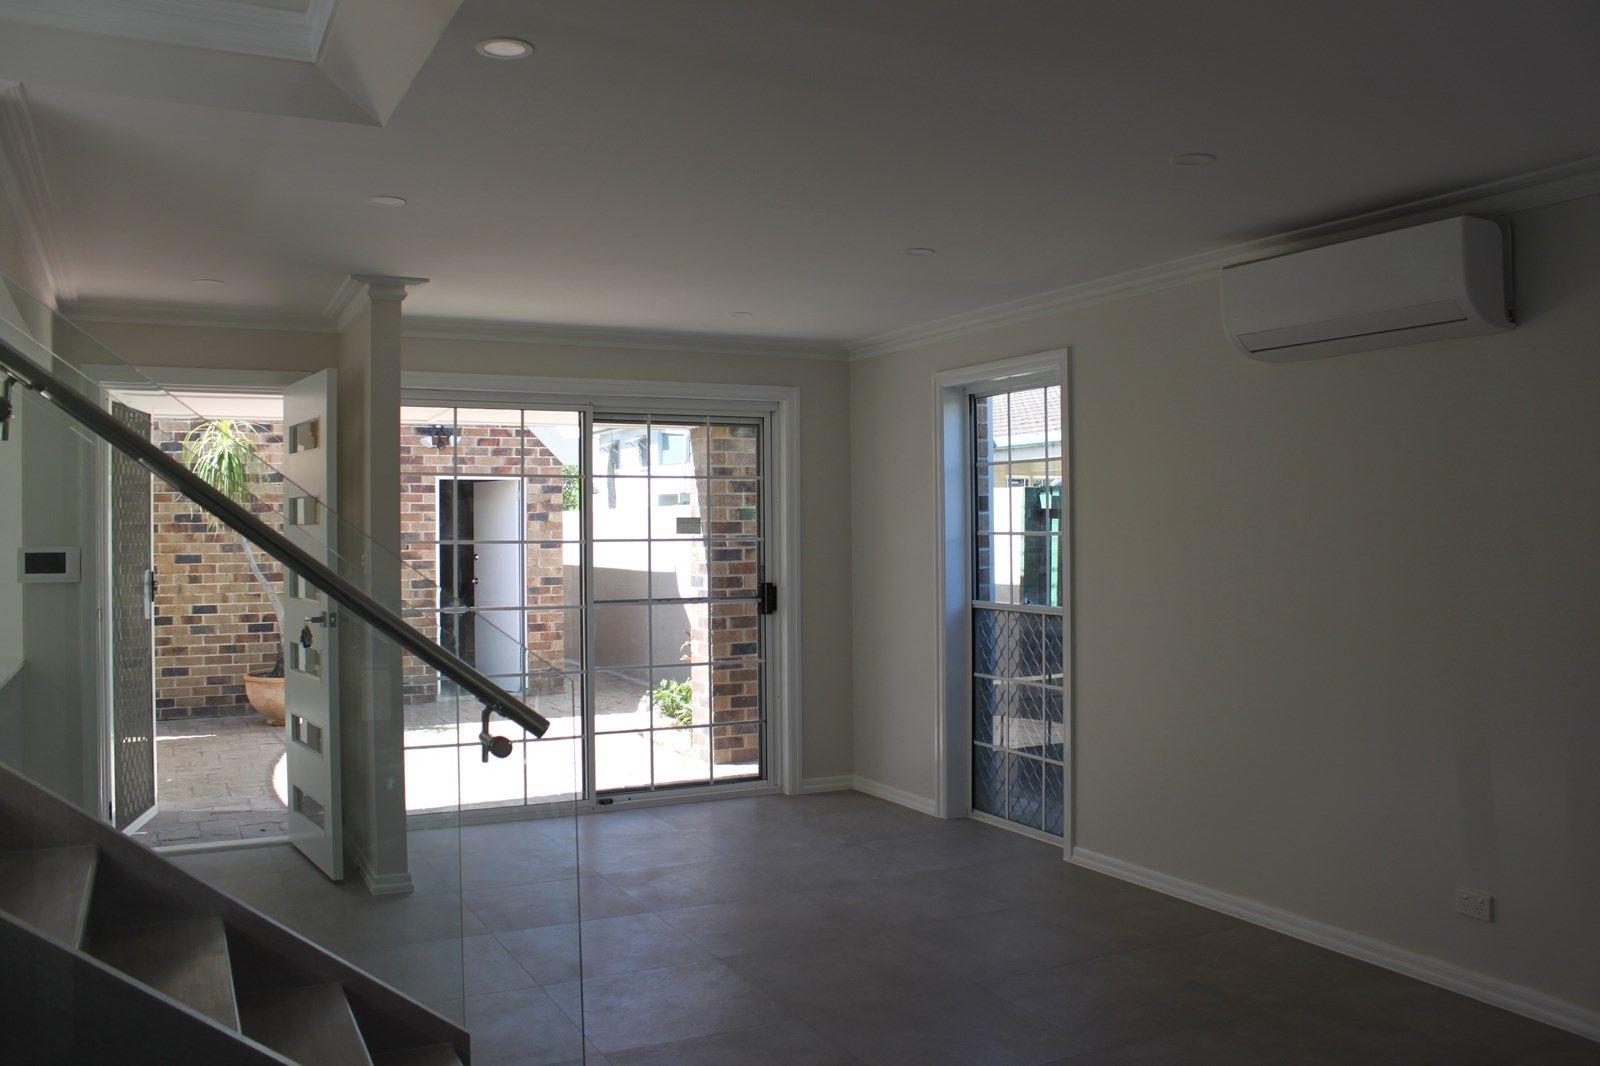 1/30 Sunbrite Avenue, Mermaid Beach QLD 4218, Image 1